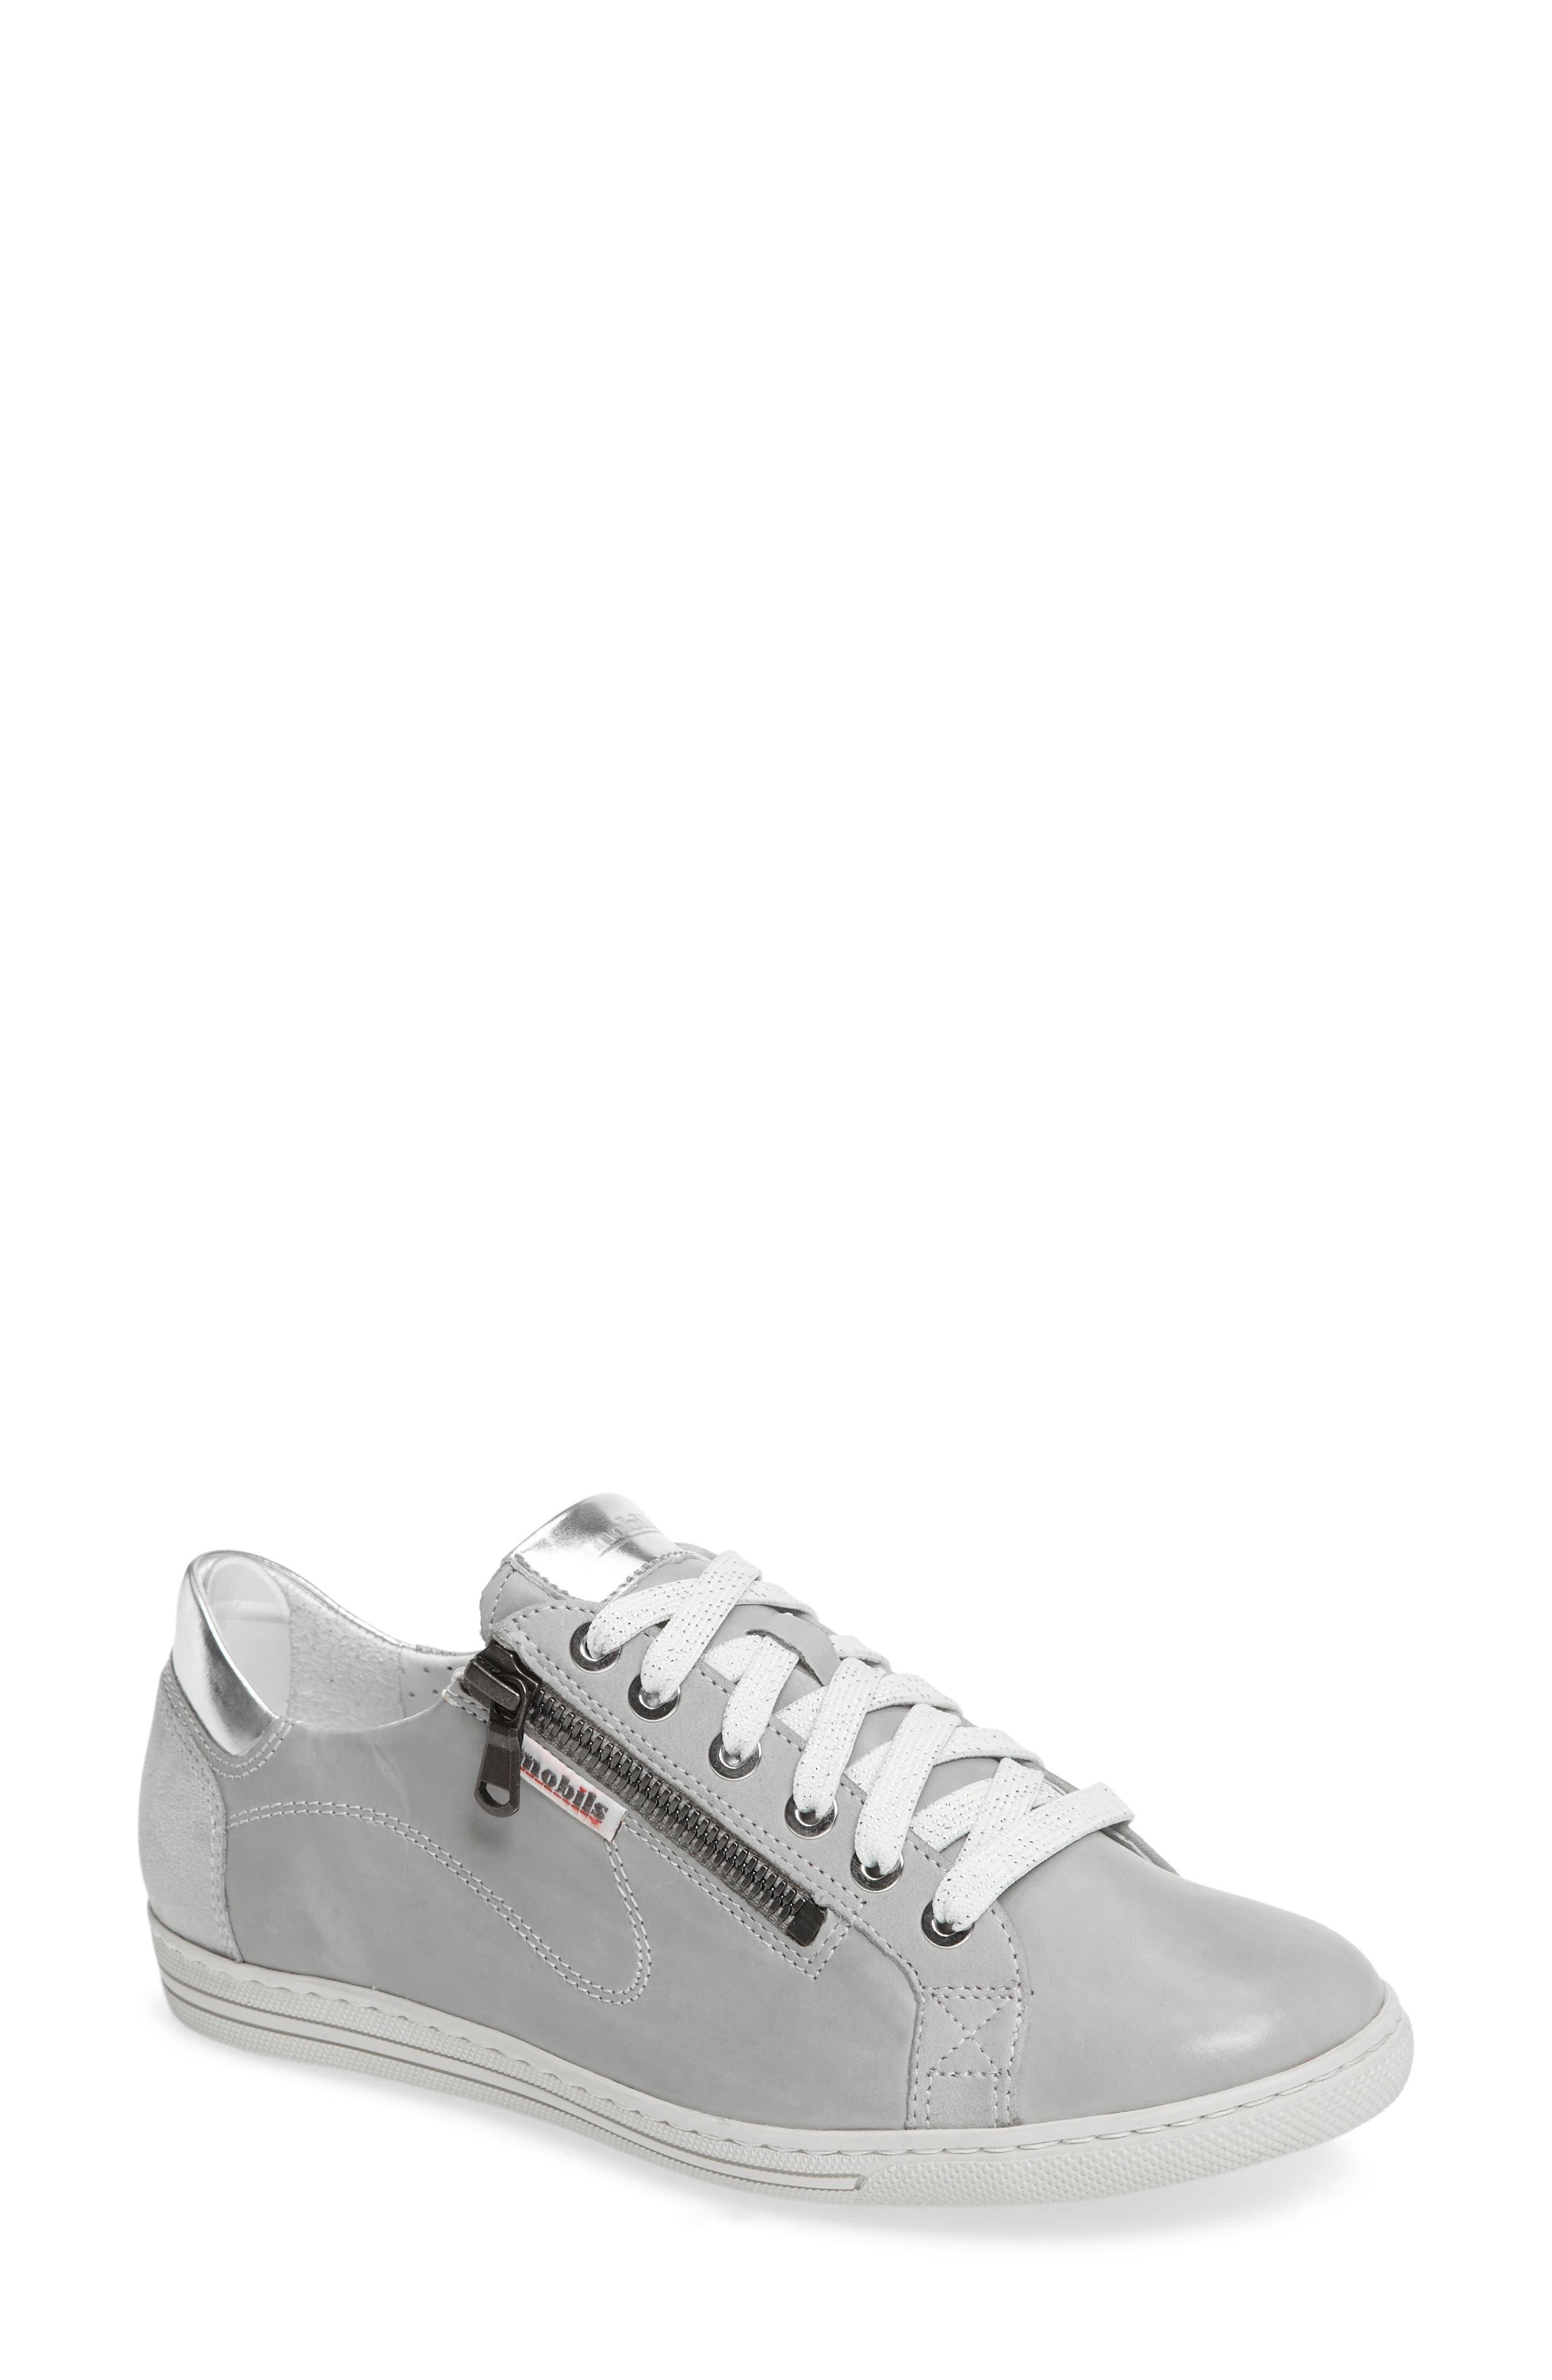 Hawai Sneaker,                         Main,                         color, Light Grey Calfskin Leather